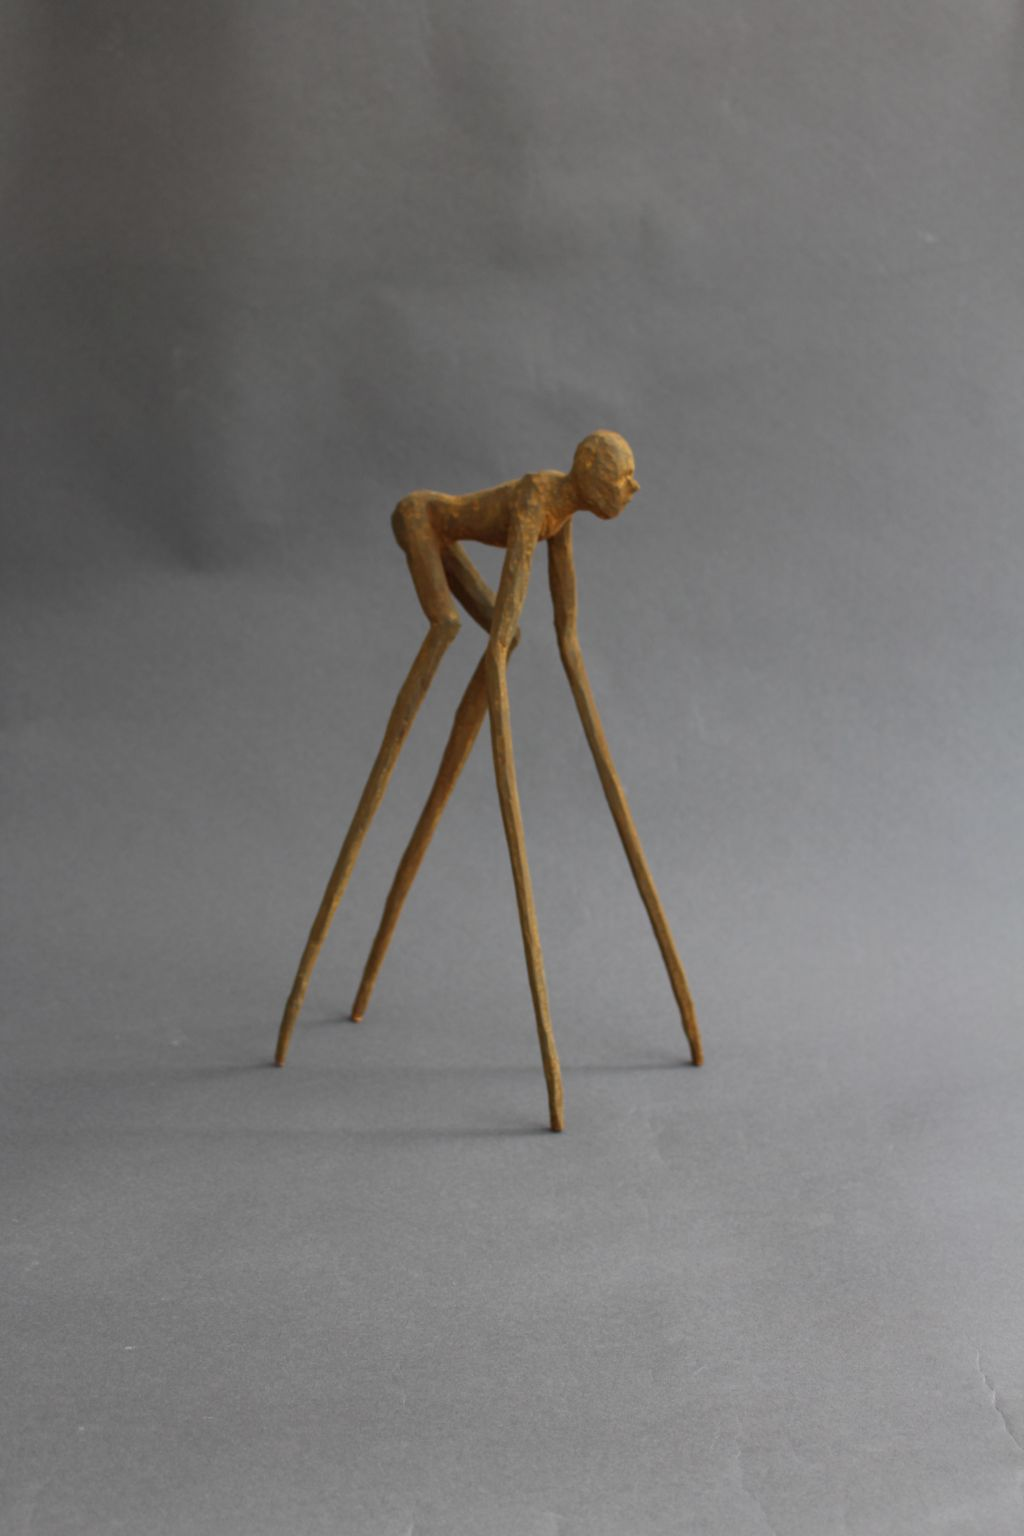 spinnenlaeufer-linde-bemalt-15x13x33cm